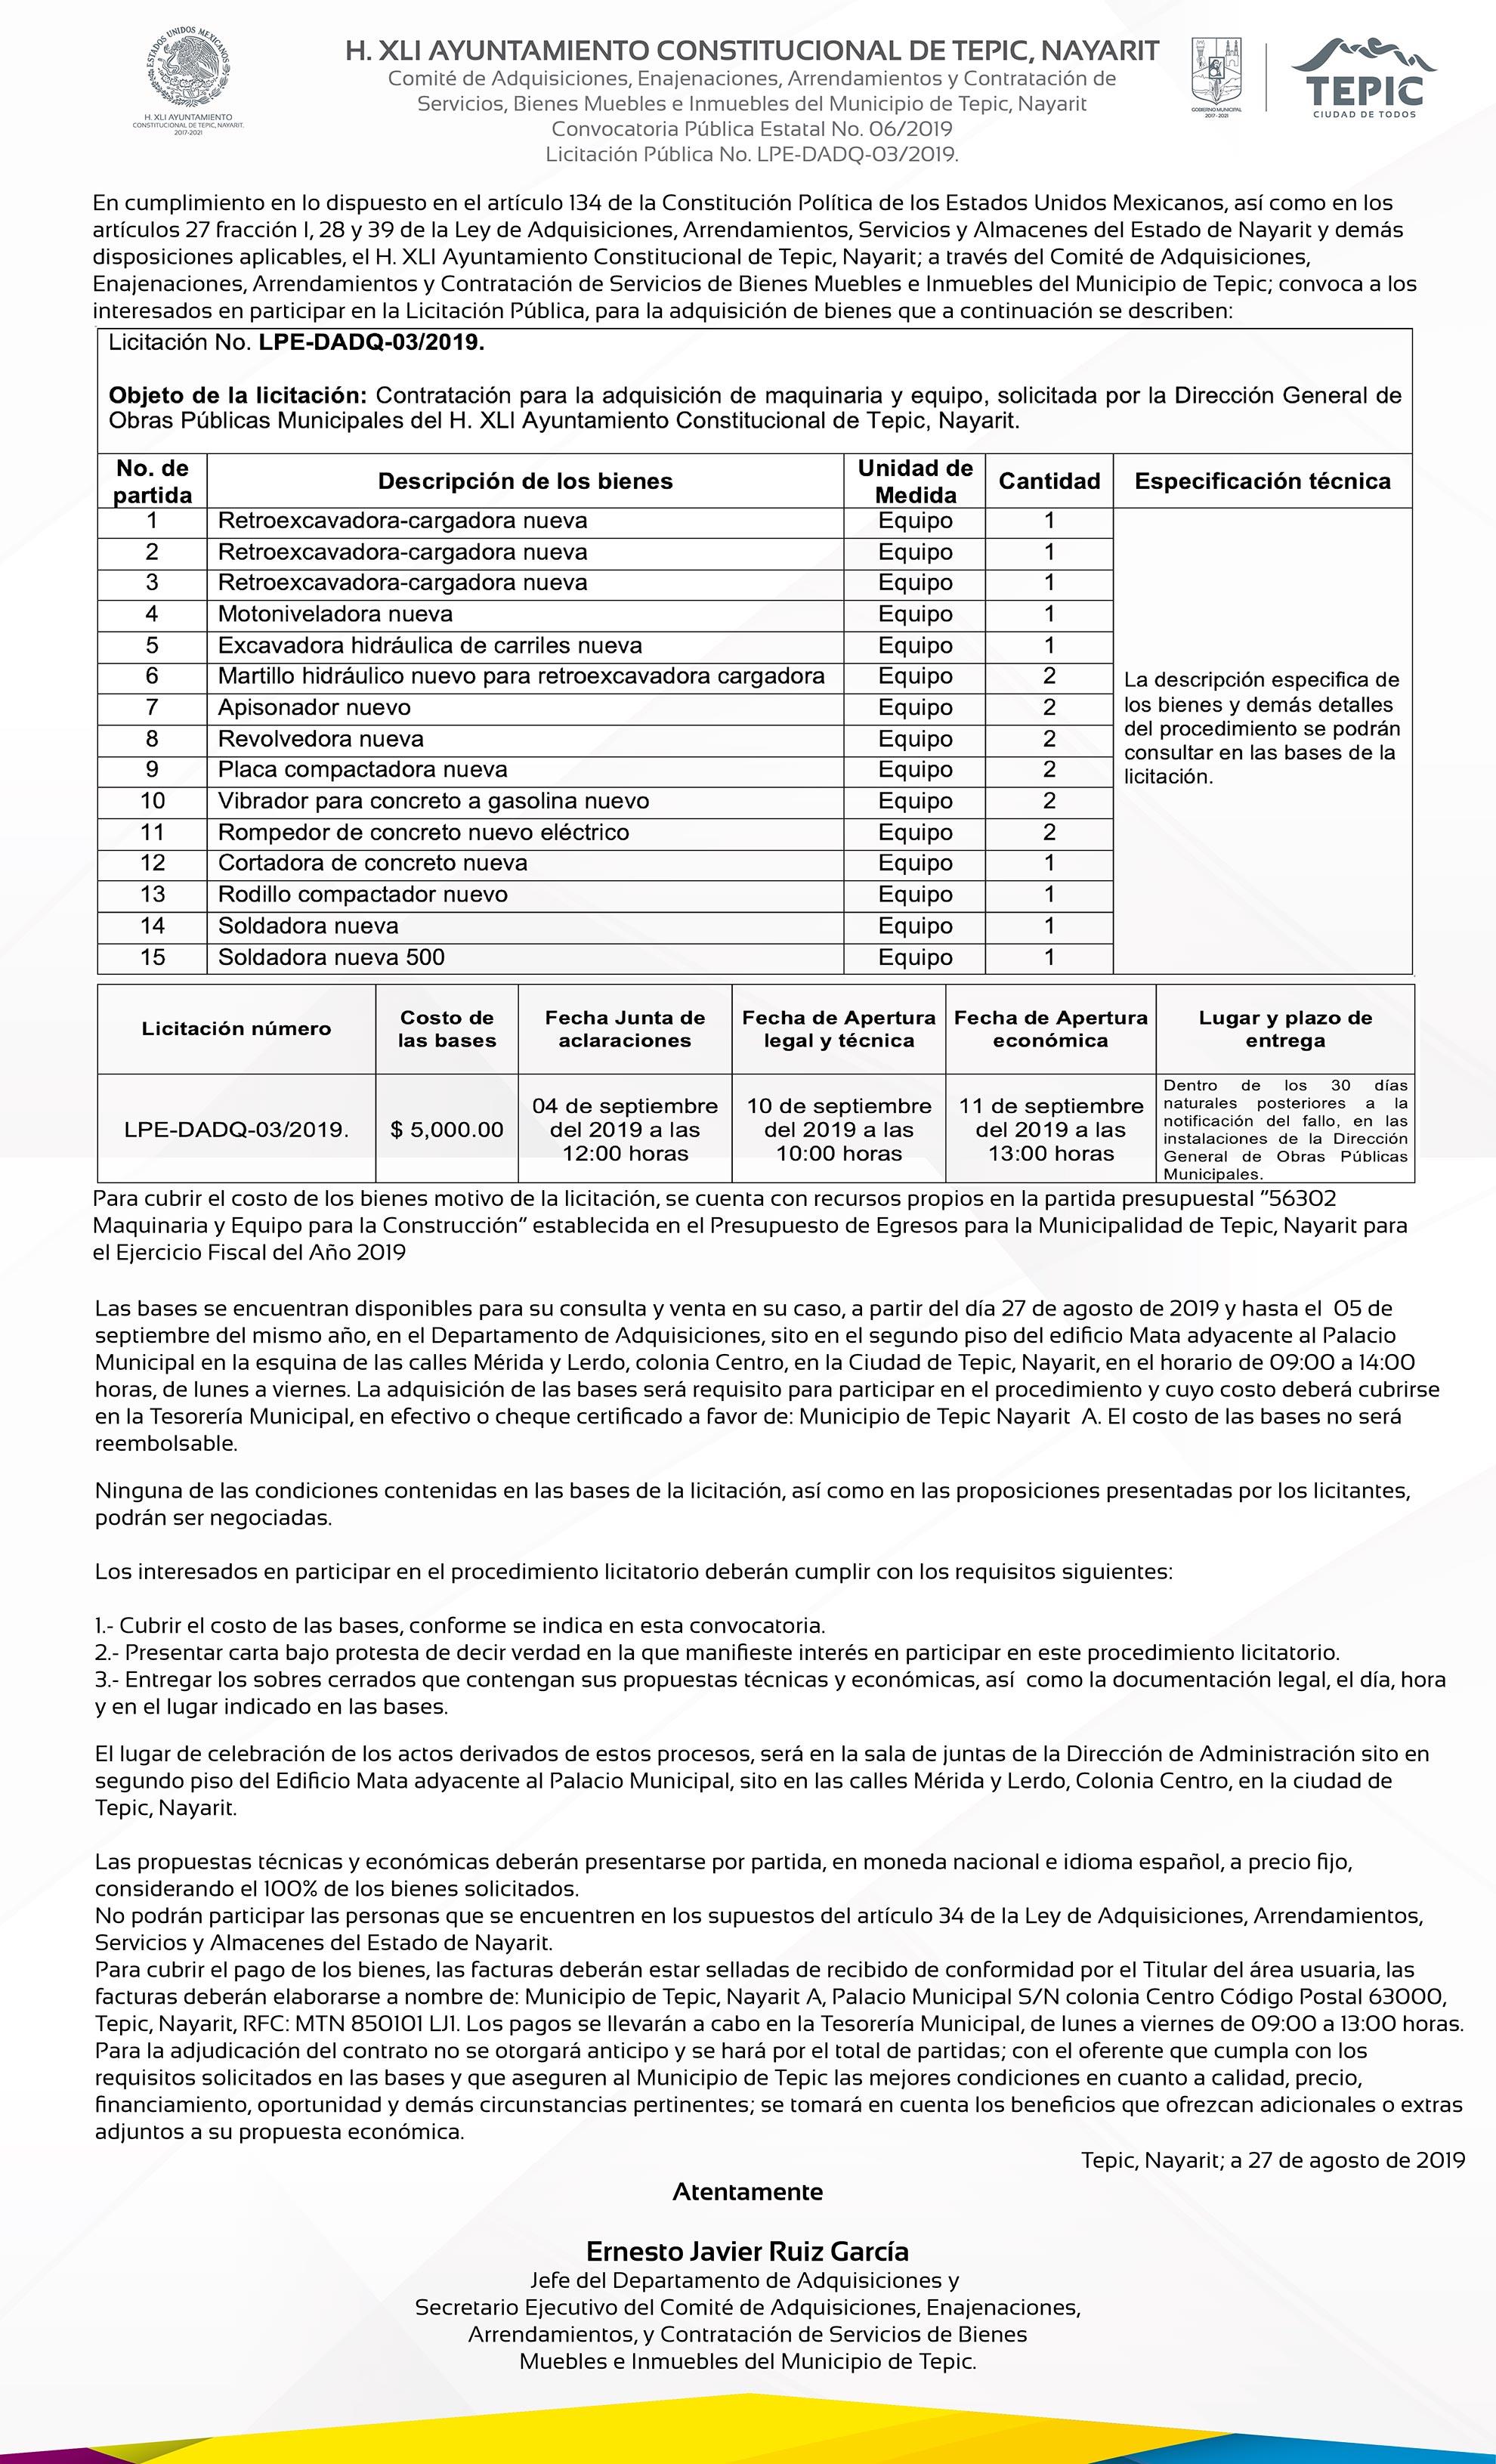 convocatoria_adquisicion_maquinaria_y_equipo